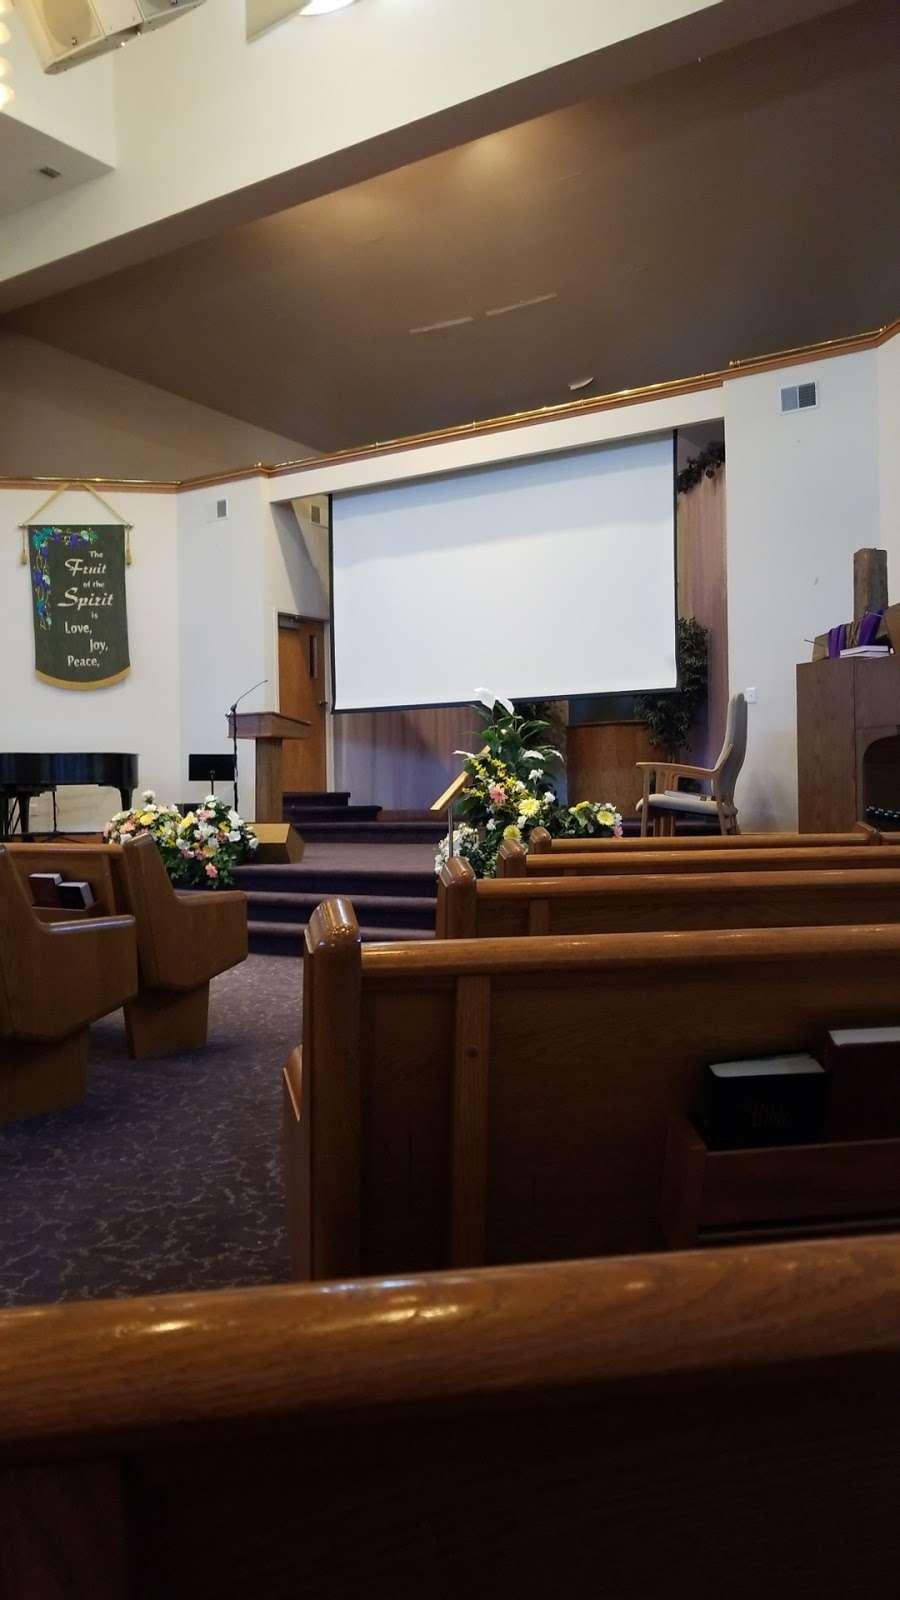 Robbinsville Seventh-Day Adventist Community Church - church  | Photo 5 of 10 | Address: 2314 NJ-33, Robbinsville, NJ 08691, USA | Phone: (609) 259-6868